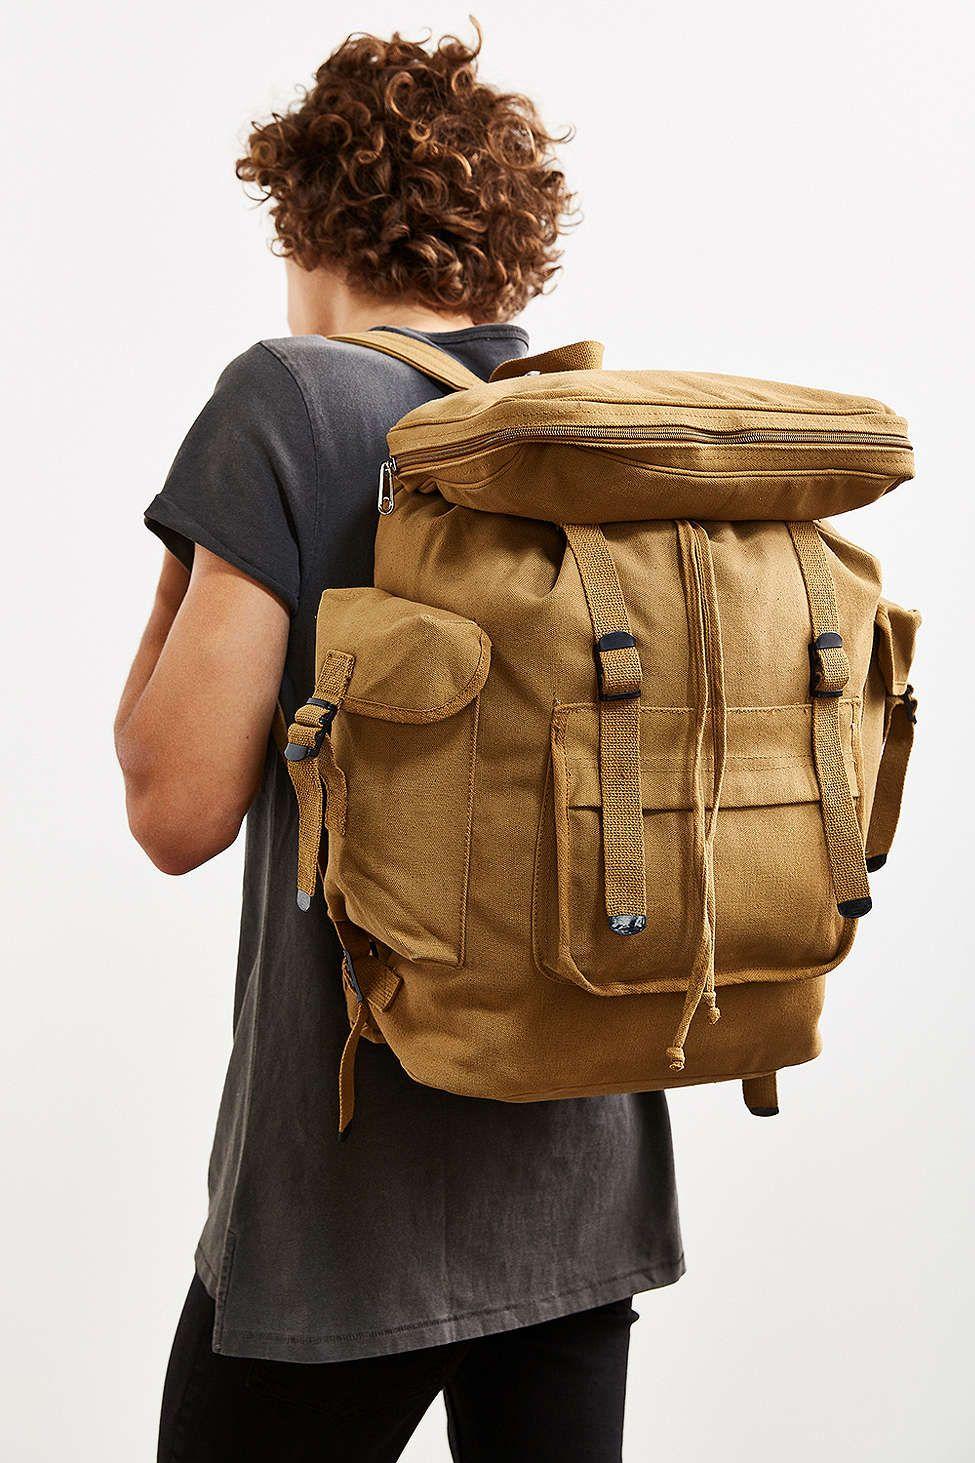 9db3ae6552a Rothco Basic Rucksack Backpack   Travel   Pinterest   Backpacks ...